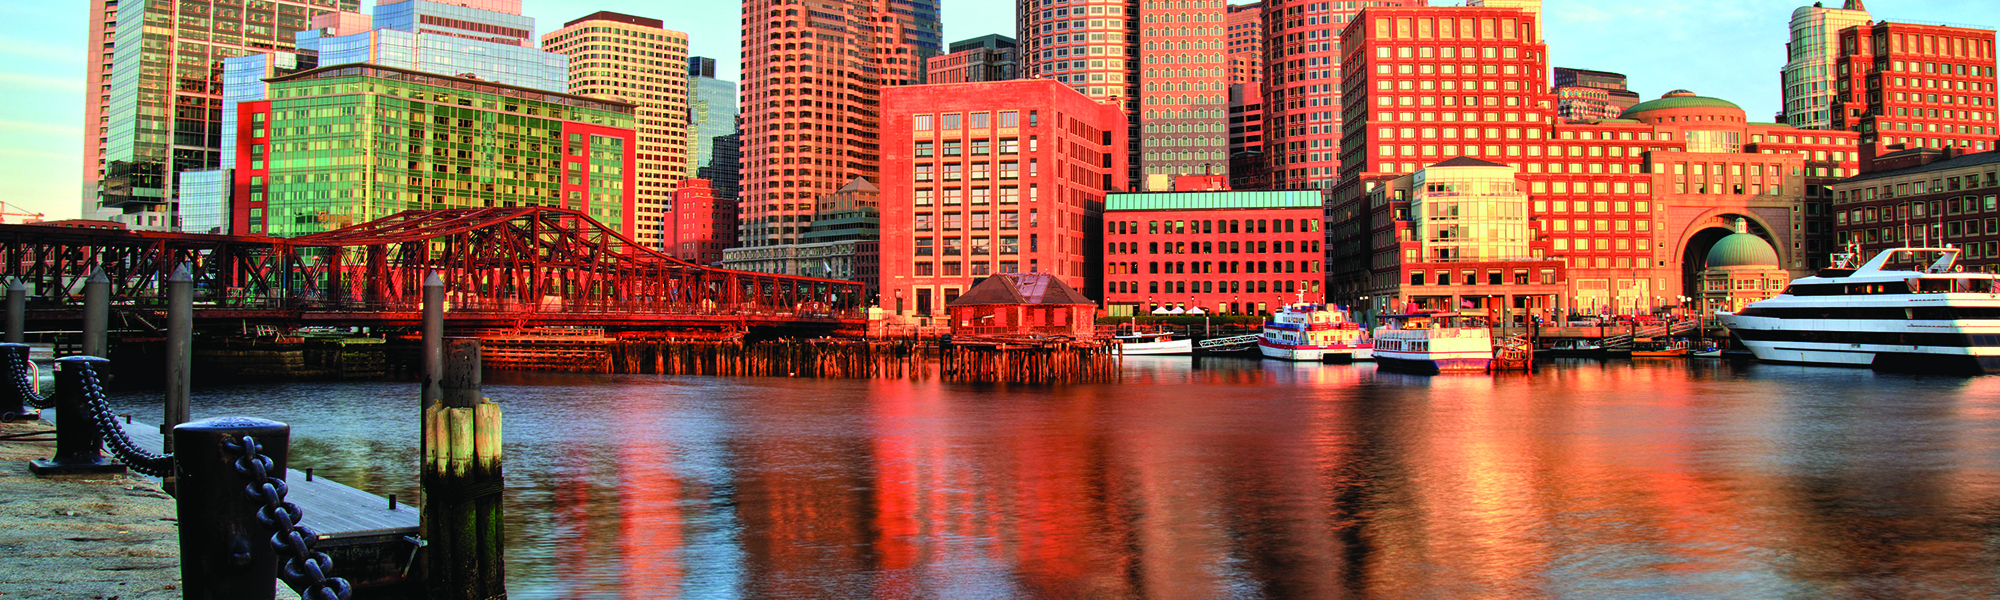 Boston, Massachusettes.jpg